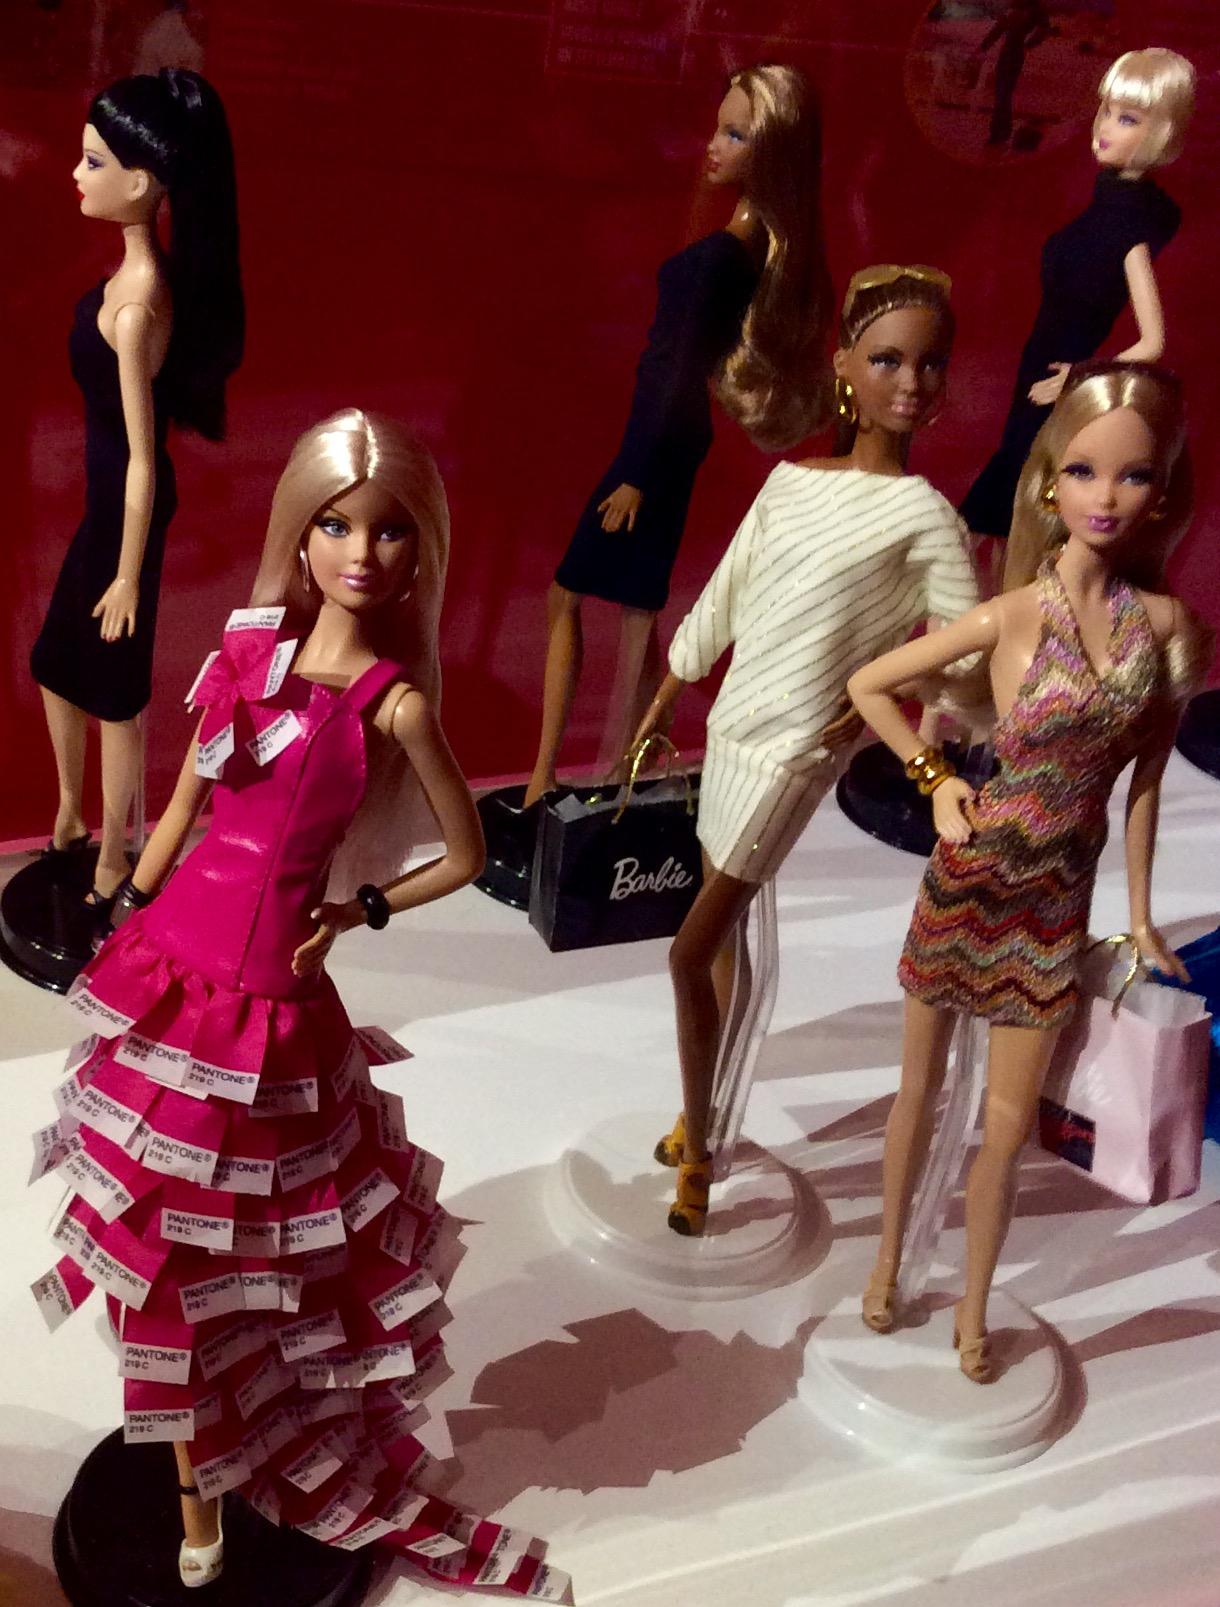 Il colore rosa di Barbie, Pantone n. 128